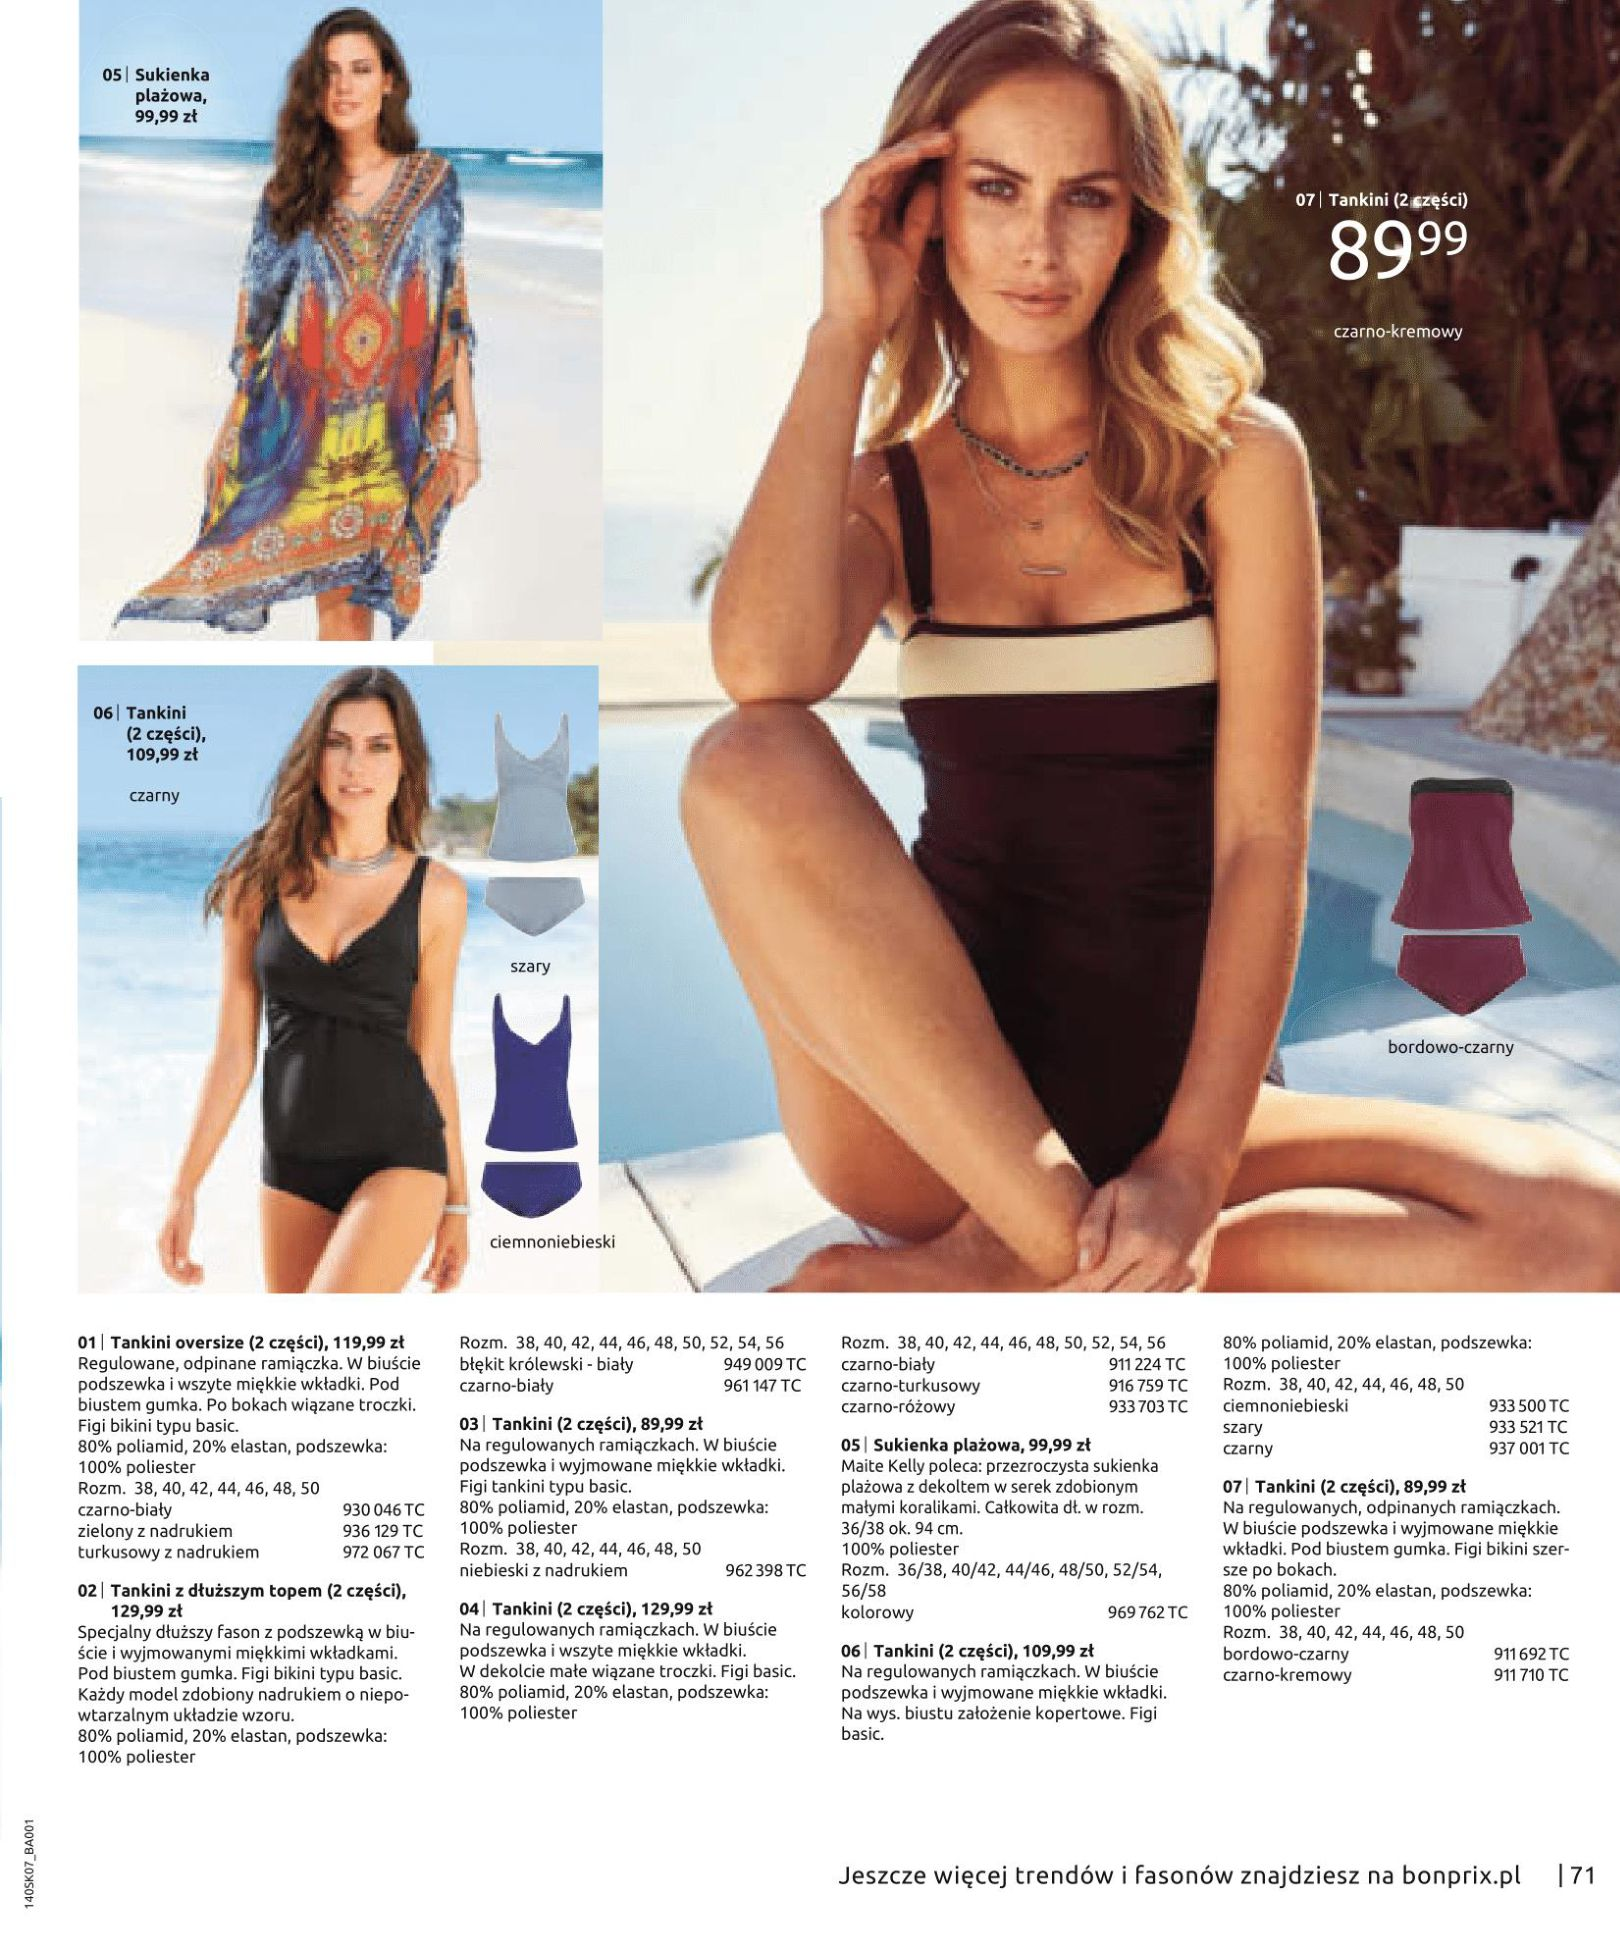 Gazetka Bonprix - Letnie trendy-02.07.2019-15.01.2020-page-73